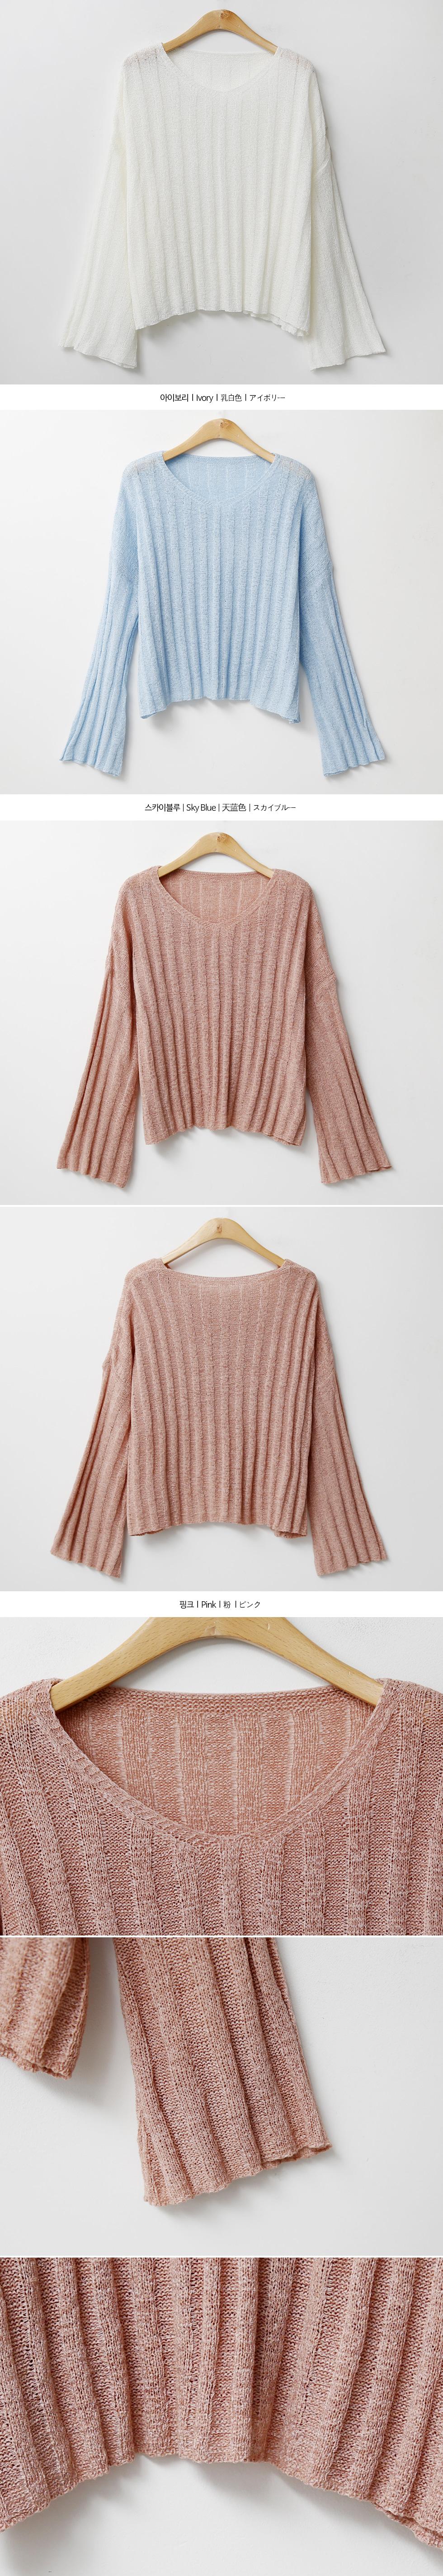 Polling knit